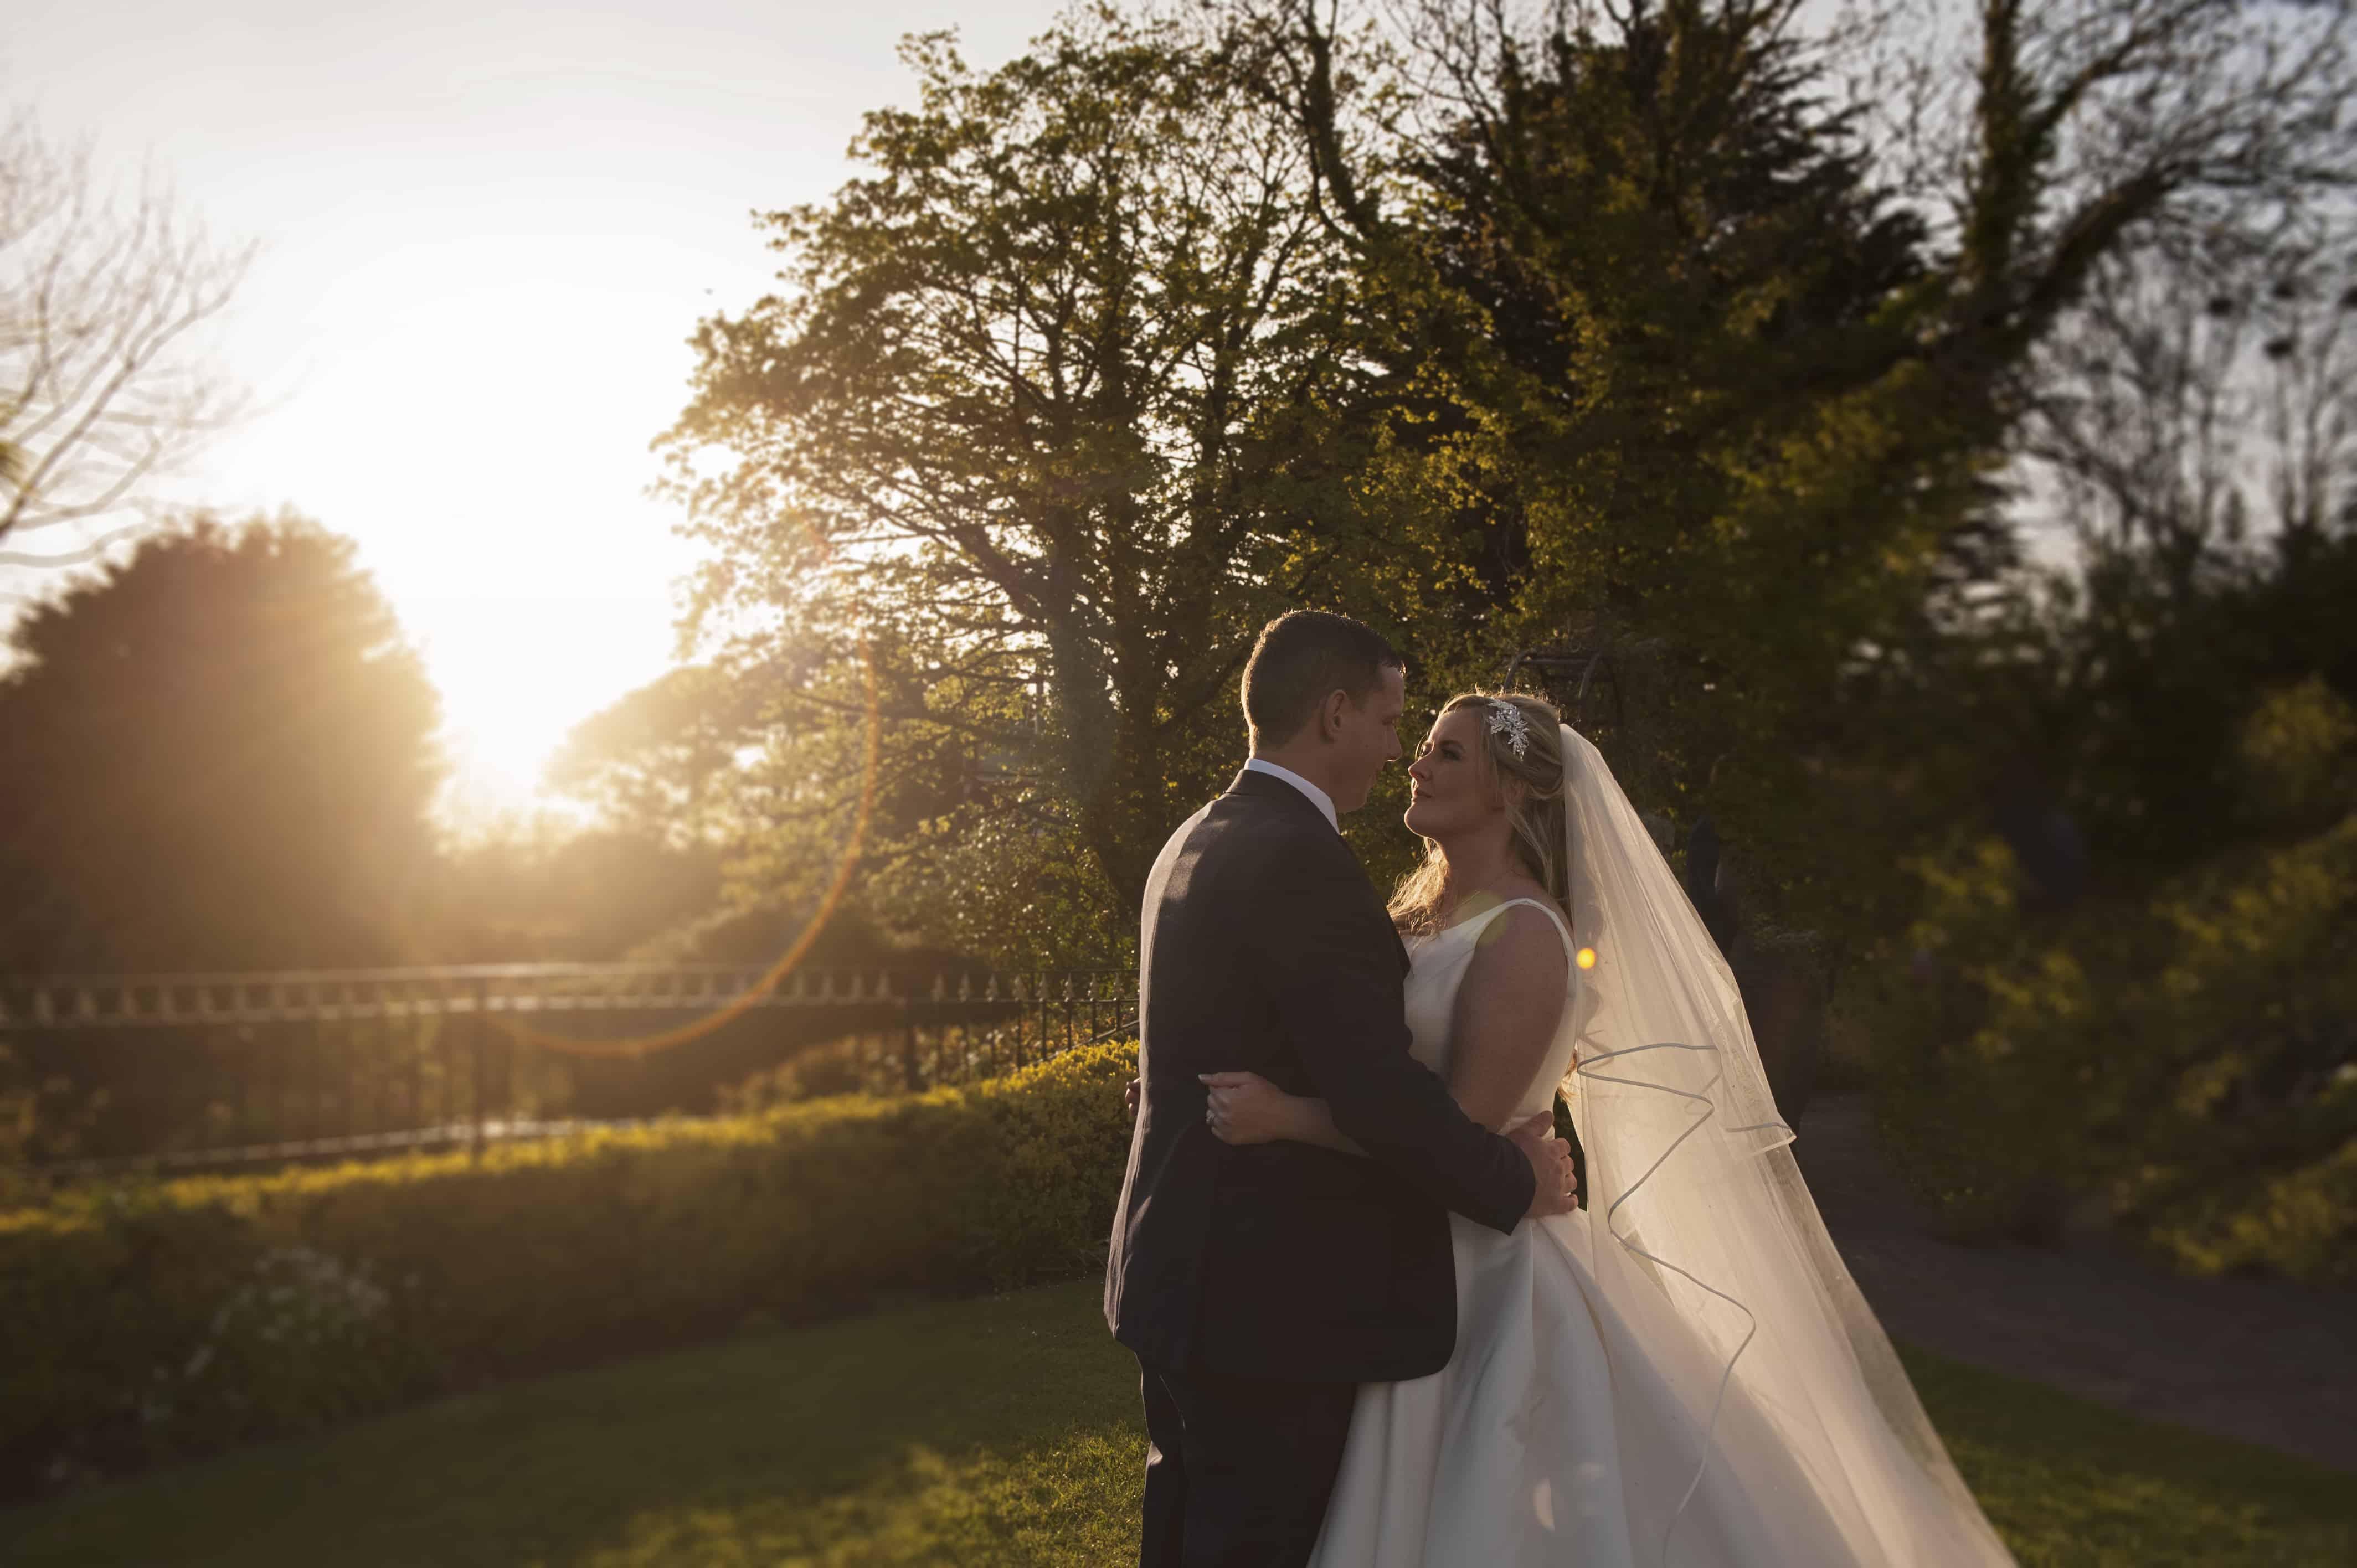 Bride & Groom Stood in sunset ~ King Arthur Hotel Wedding